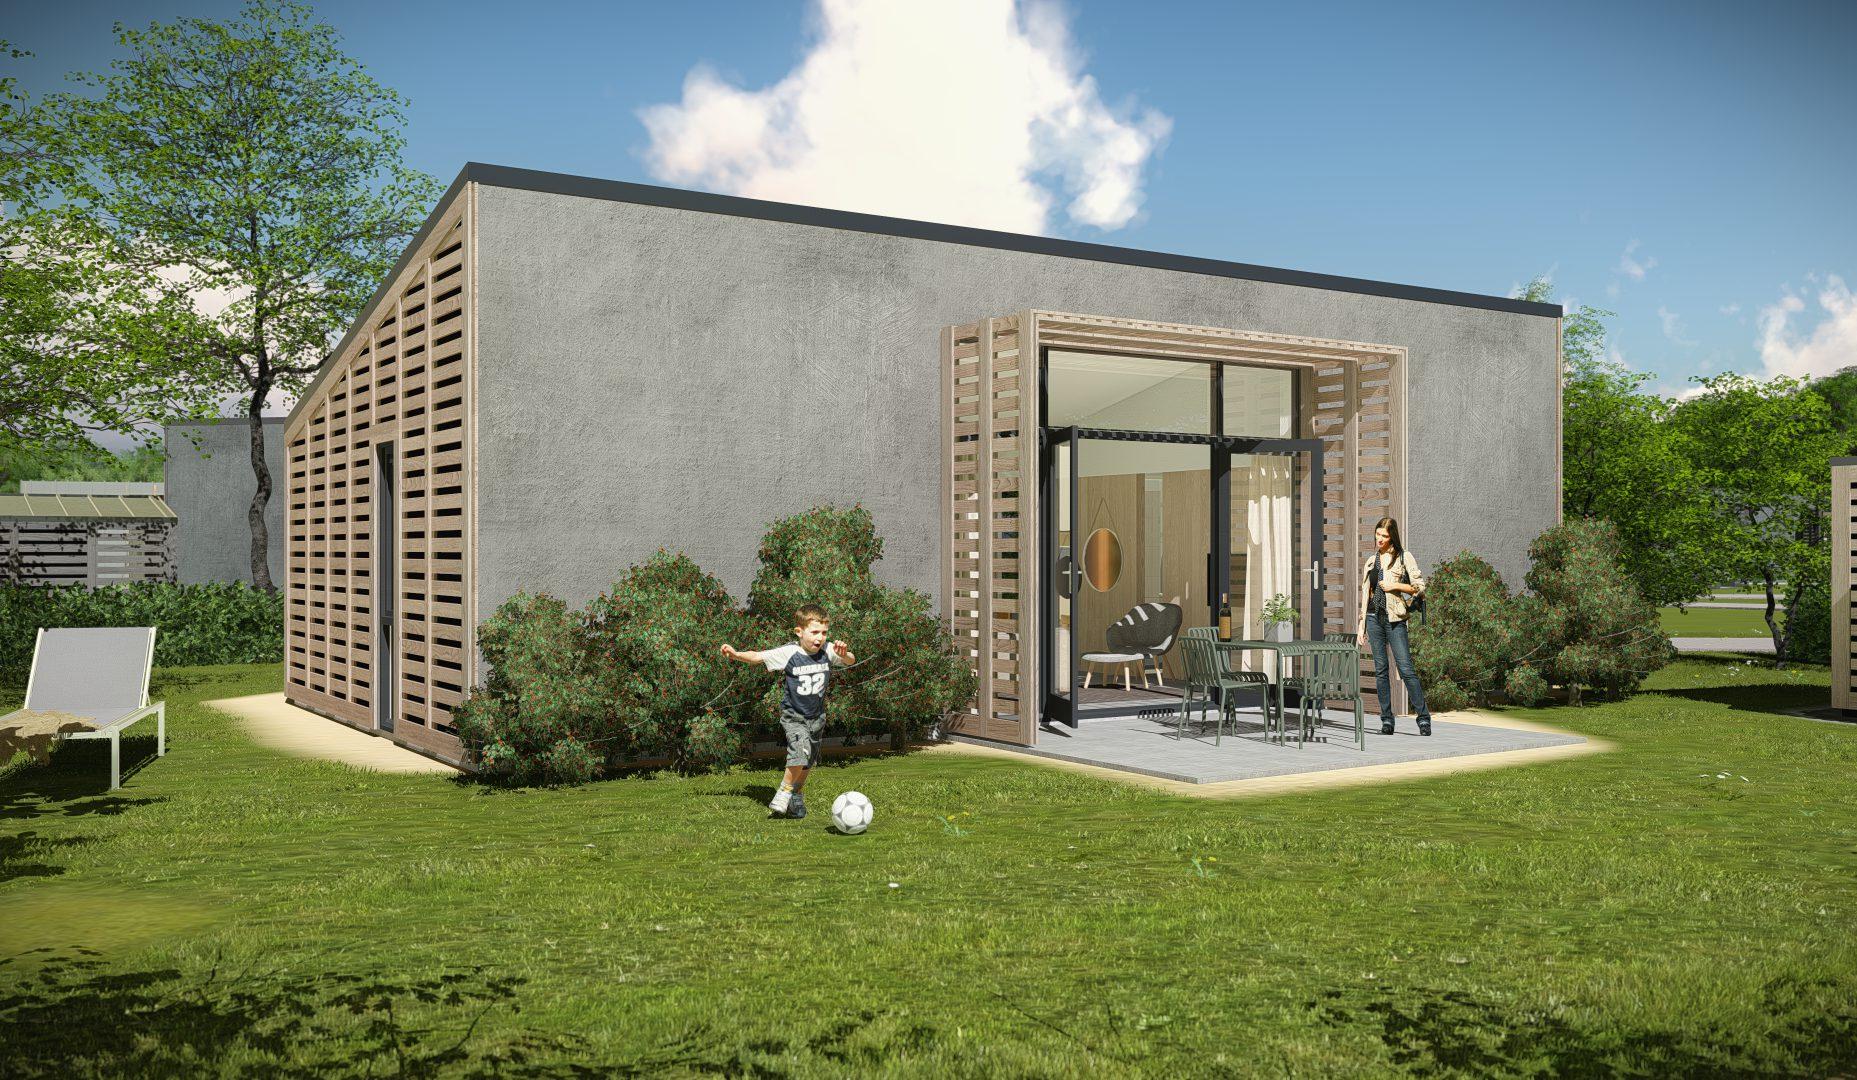 Gooilanden – Fase 3 – Woningtype Sperwershof